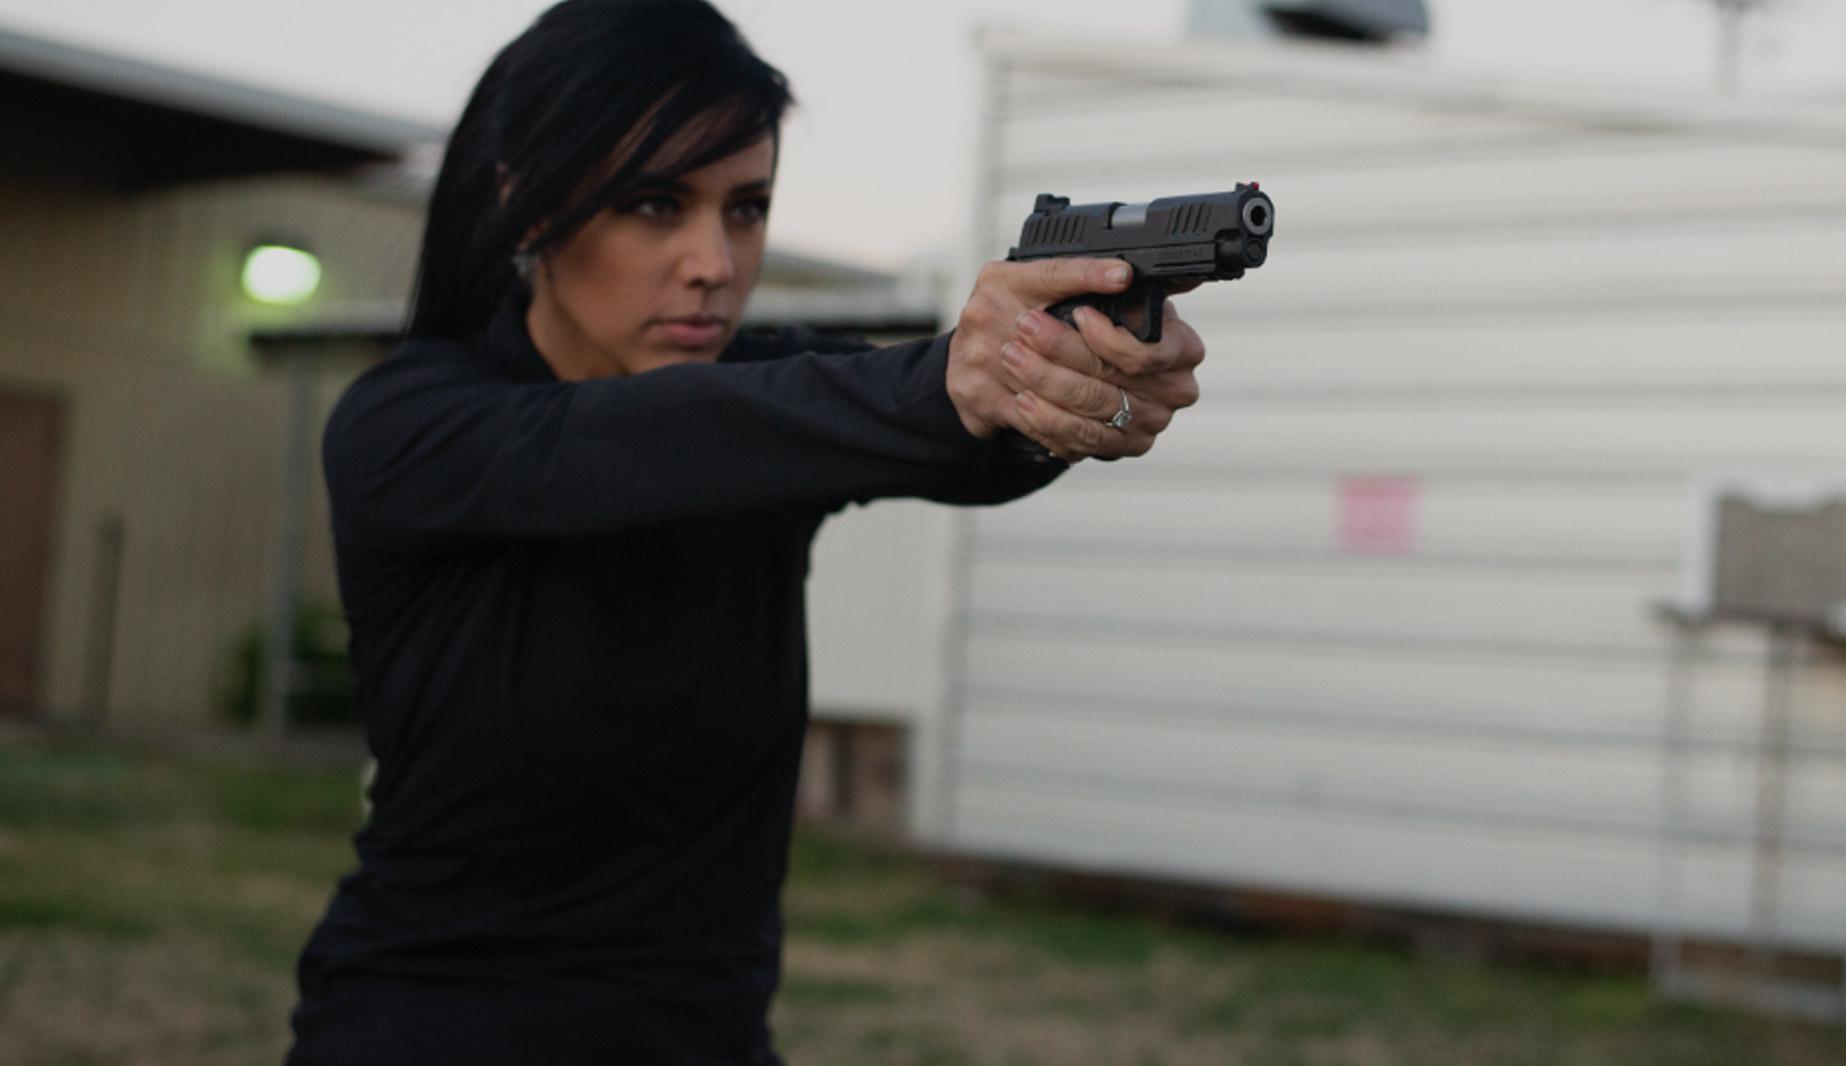 Woman aiming staccato handgun outdoors